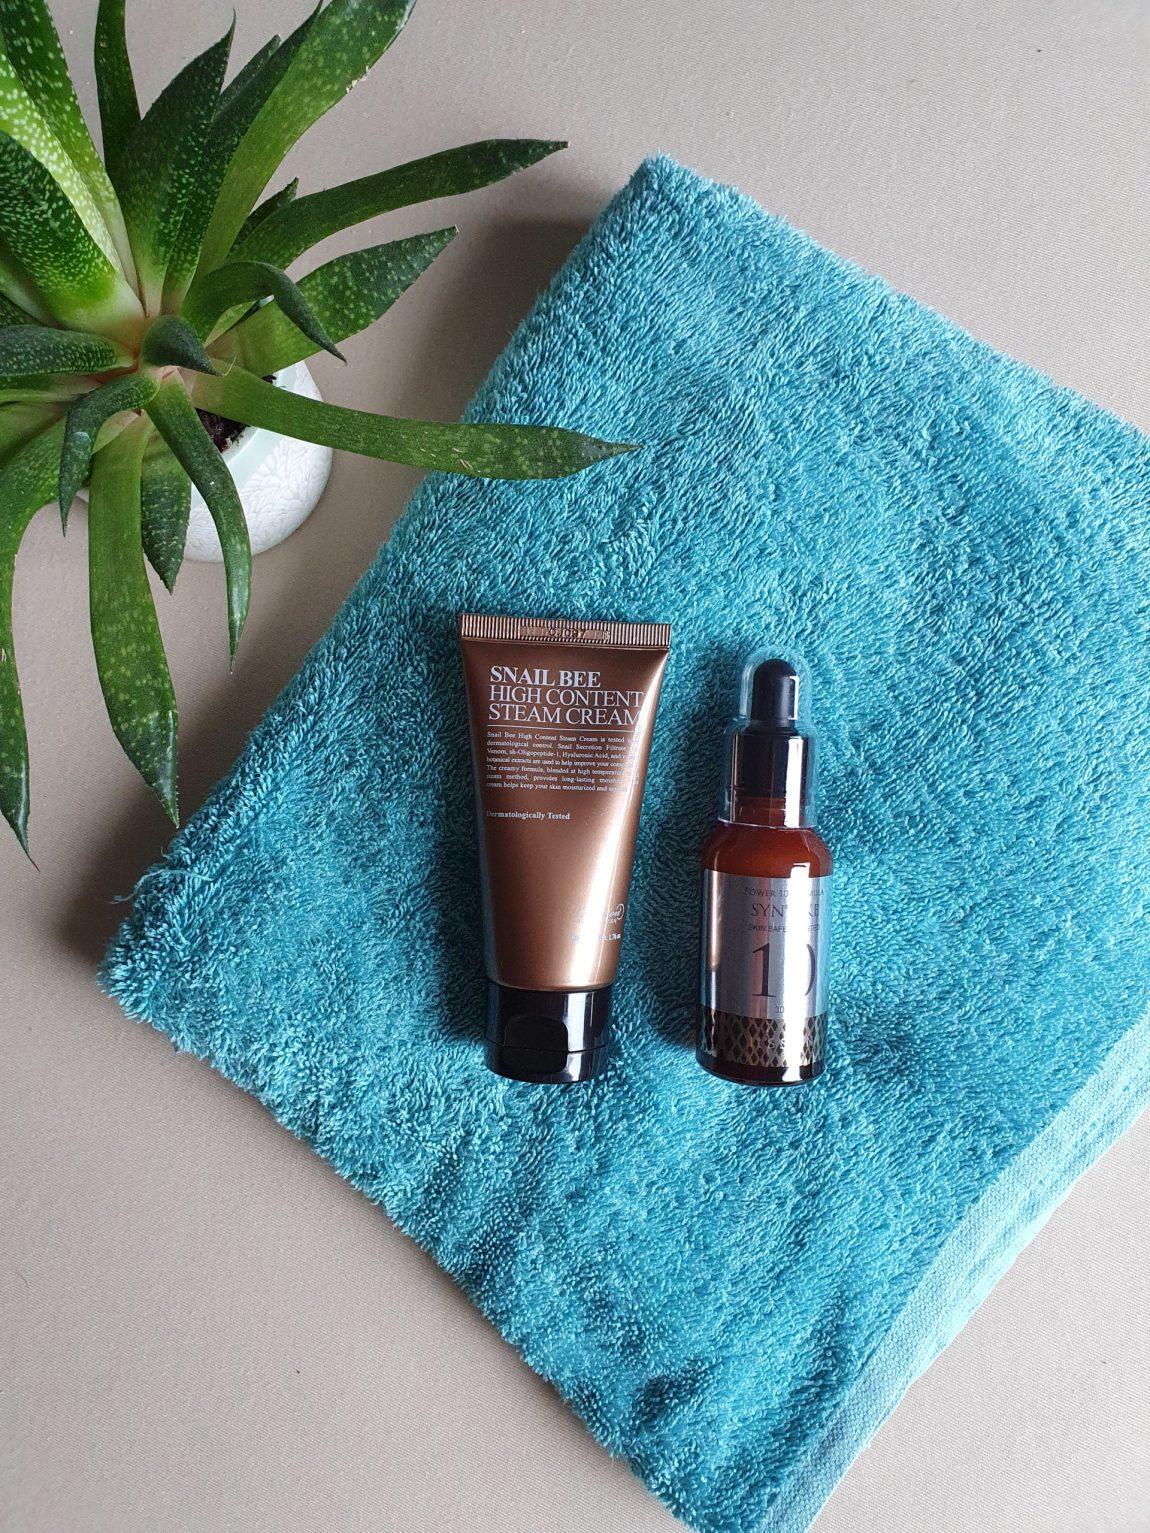 benton-serum-koreanbeautyroutine-products